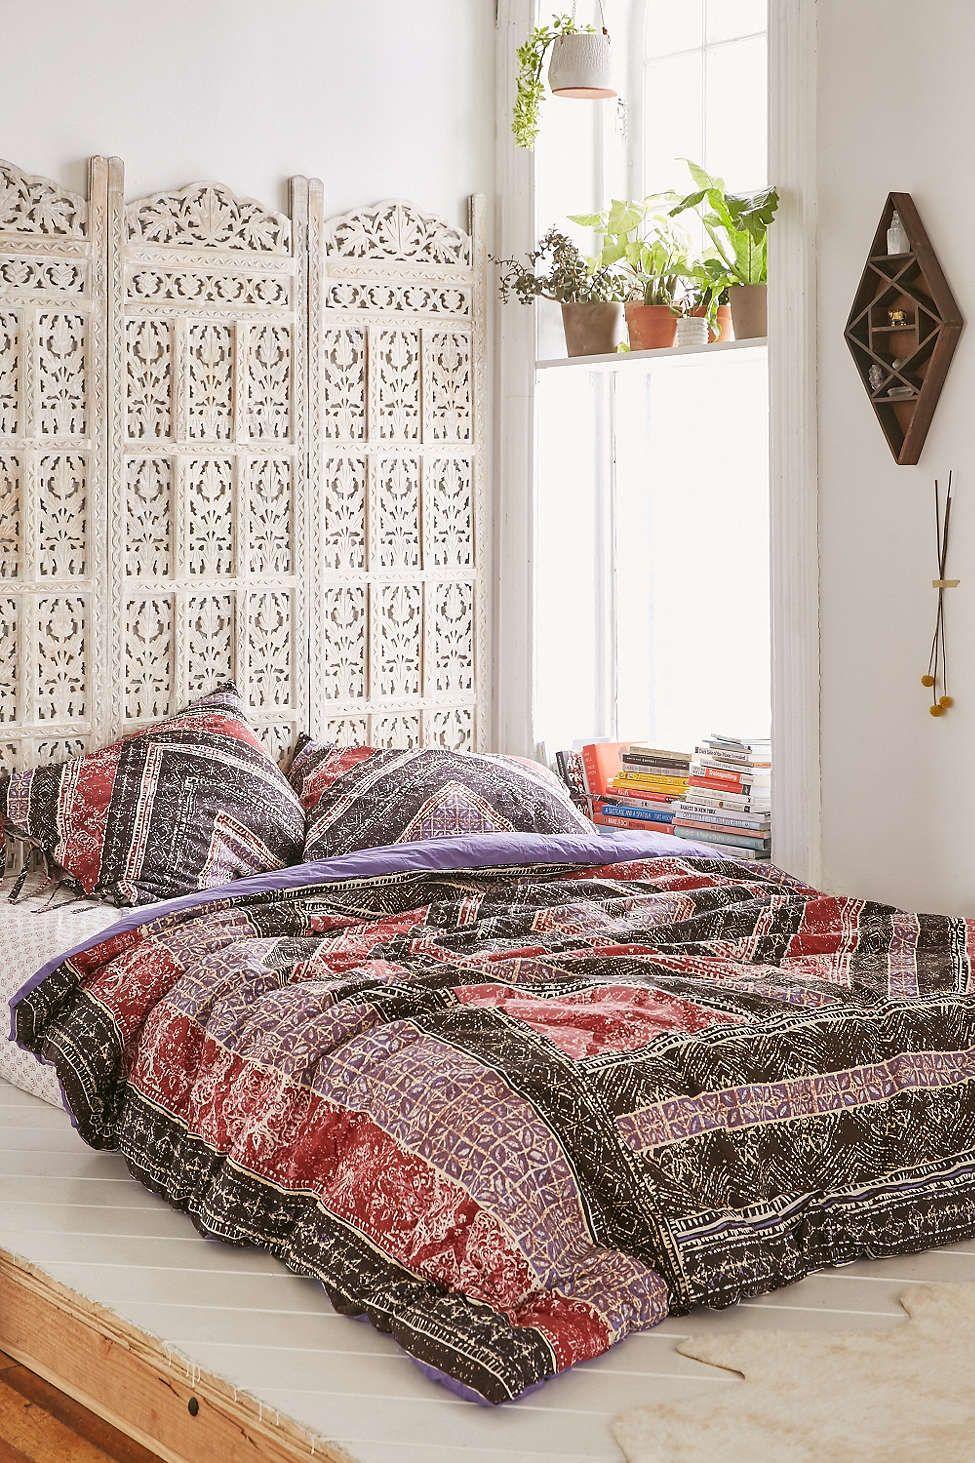 Magical Thinking Omani Worn Carpet Comforter Urban